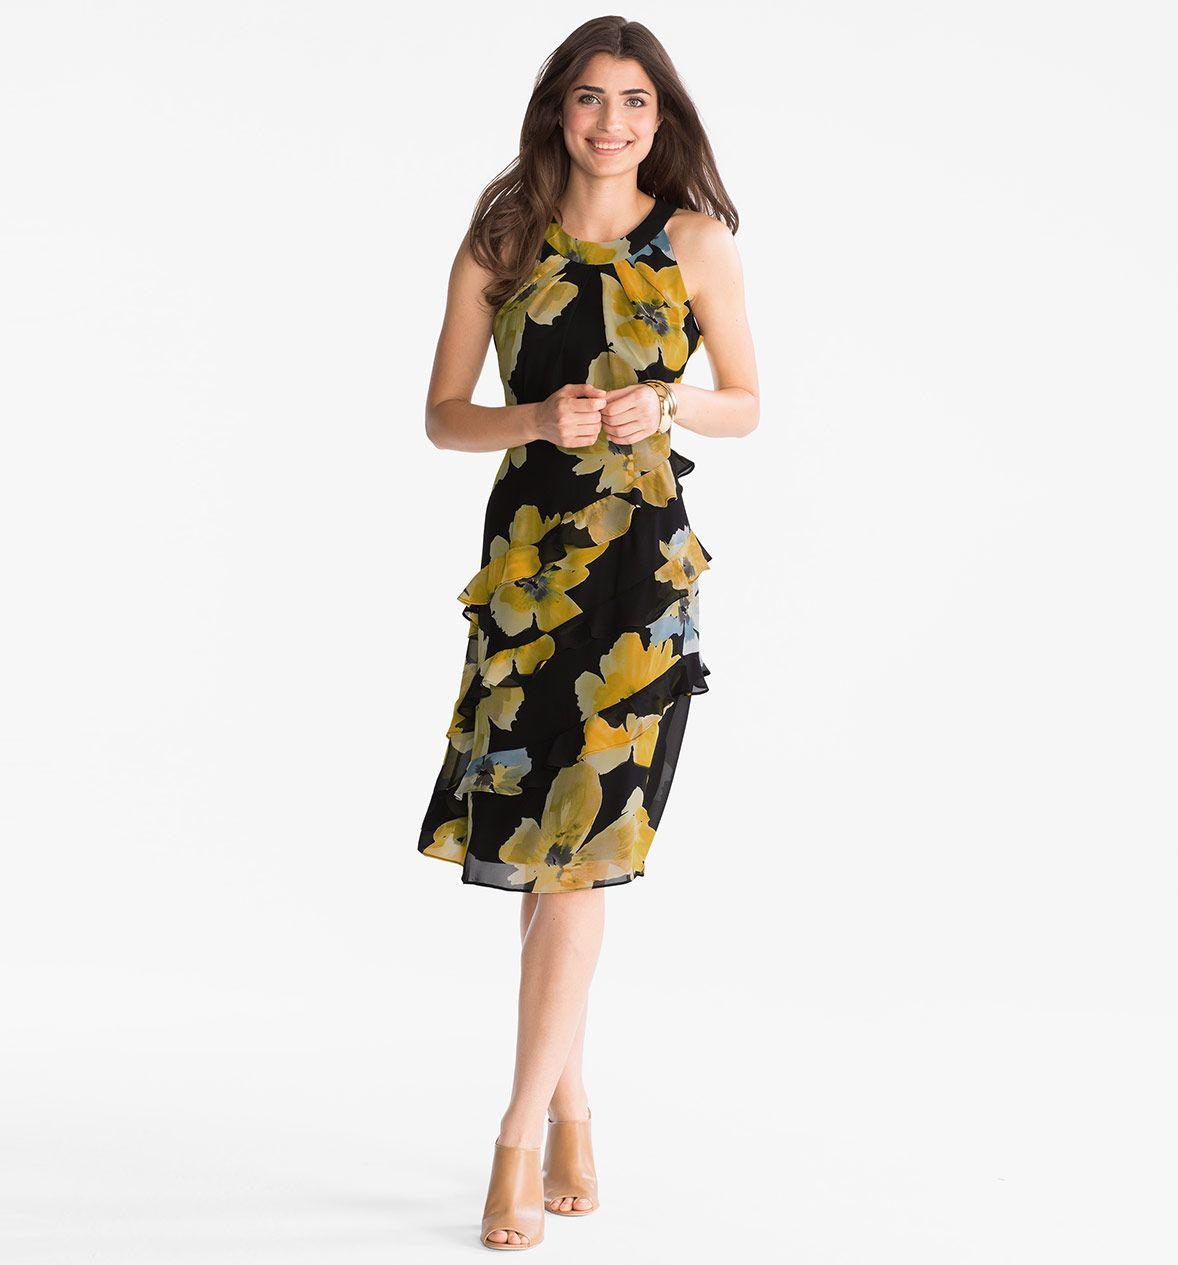 Kleid in gelb | Fashion, Dresses, Dresses for work